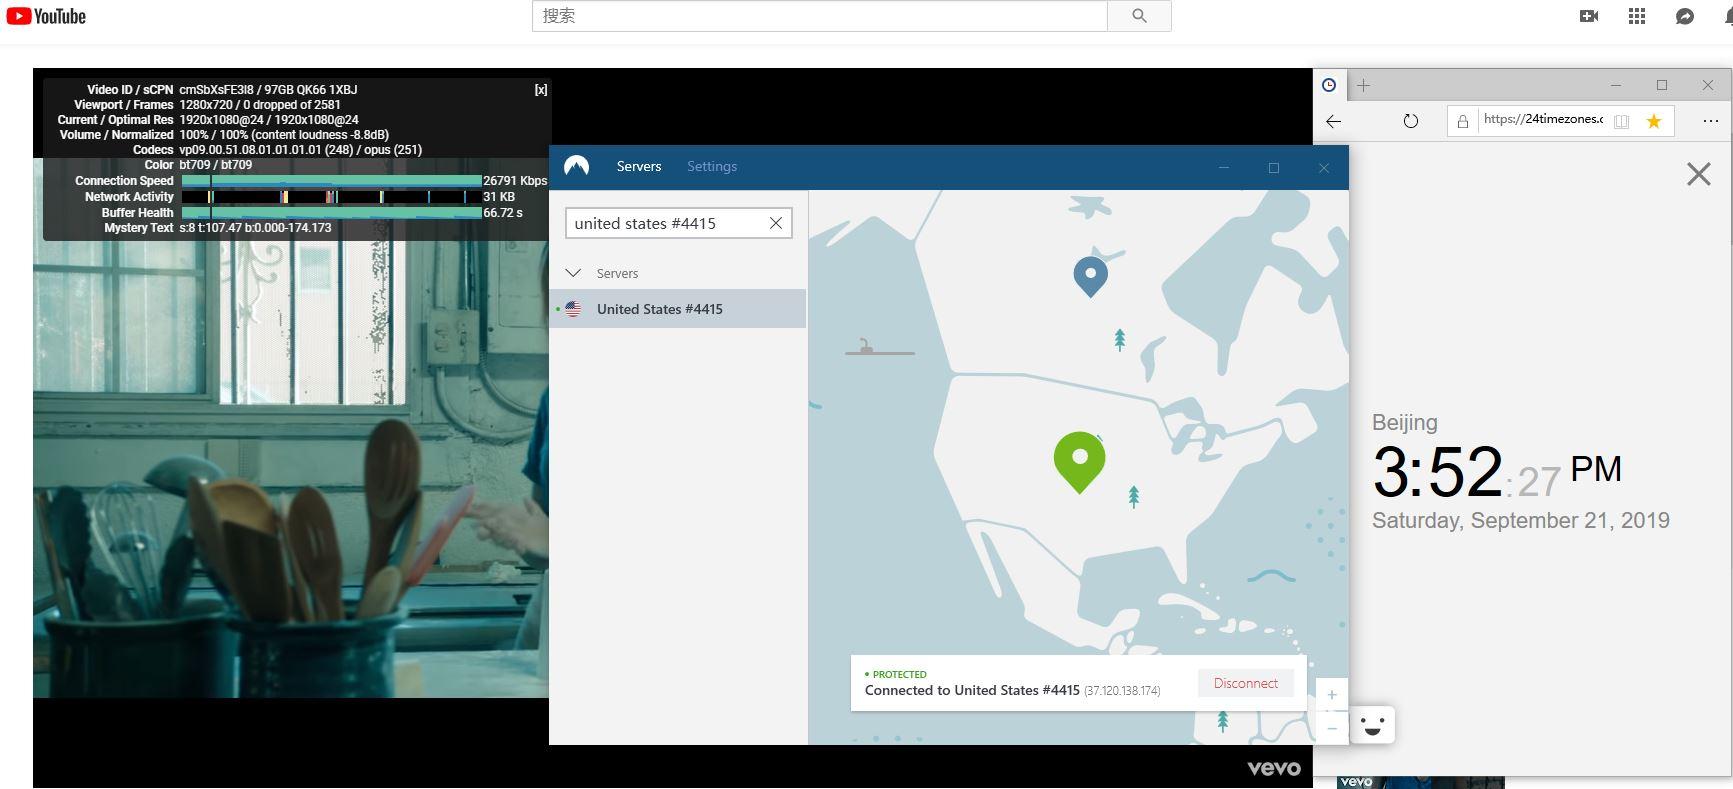 windows NordVPN United States 4415 中国VPN翻墙 科学上网 YouTube测速-20190921